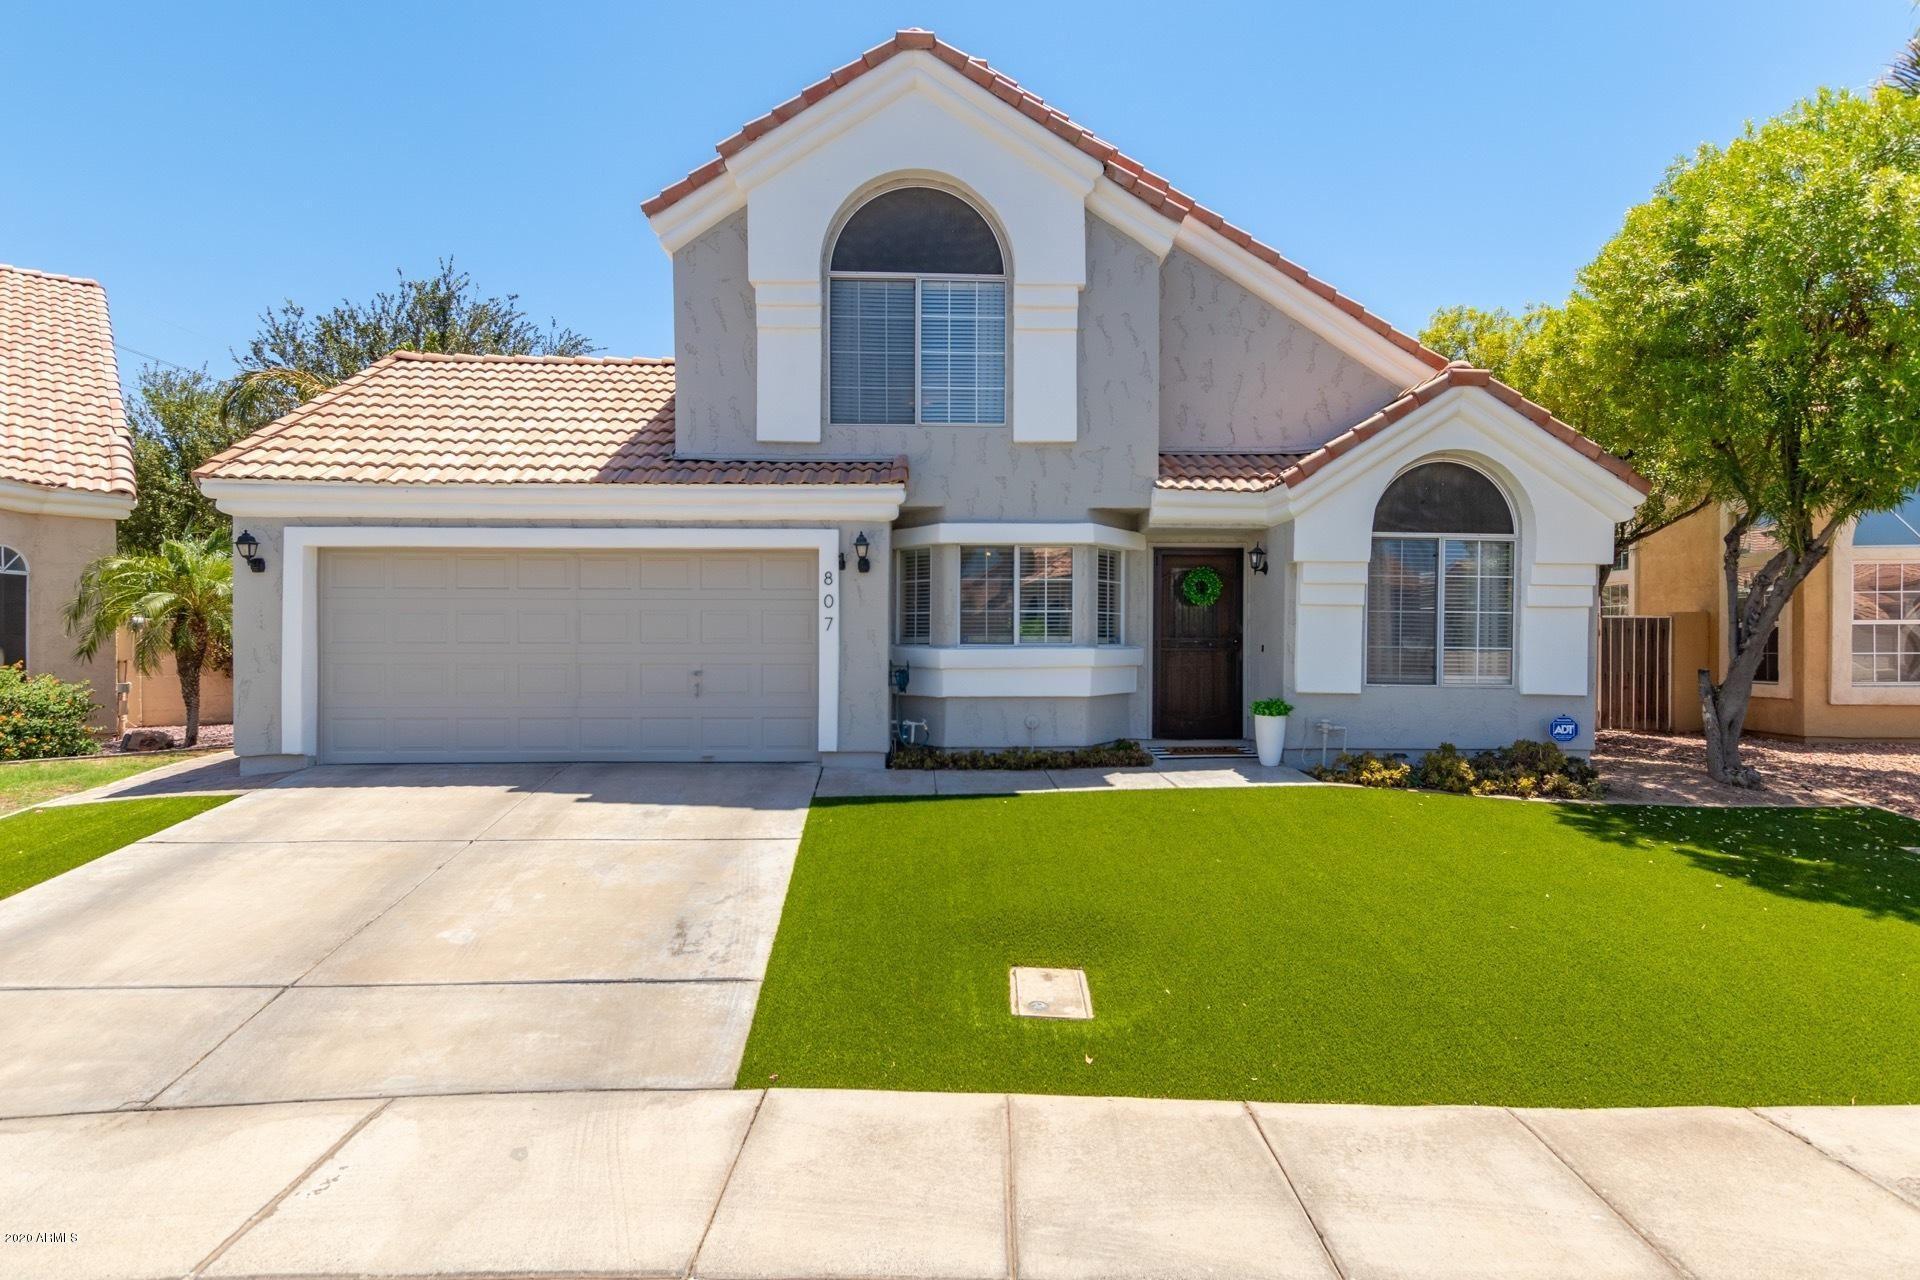 807 W BRADFORD Drive, Gilbert, AZ 85233 - #: 6100134